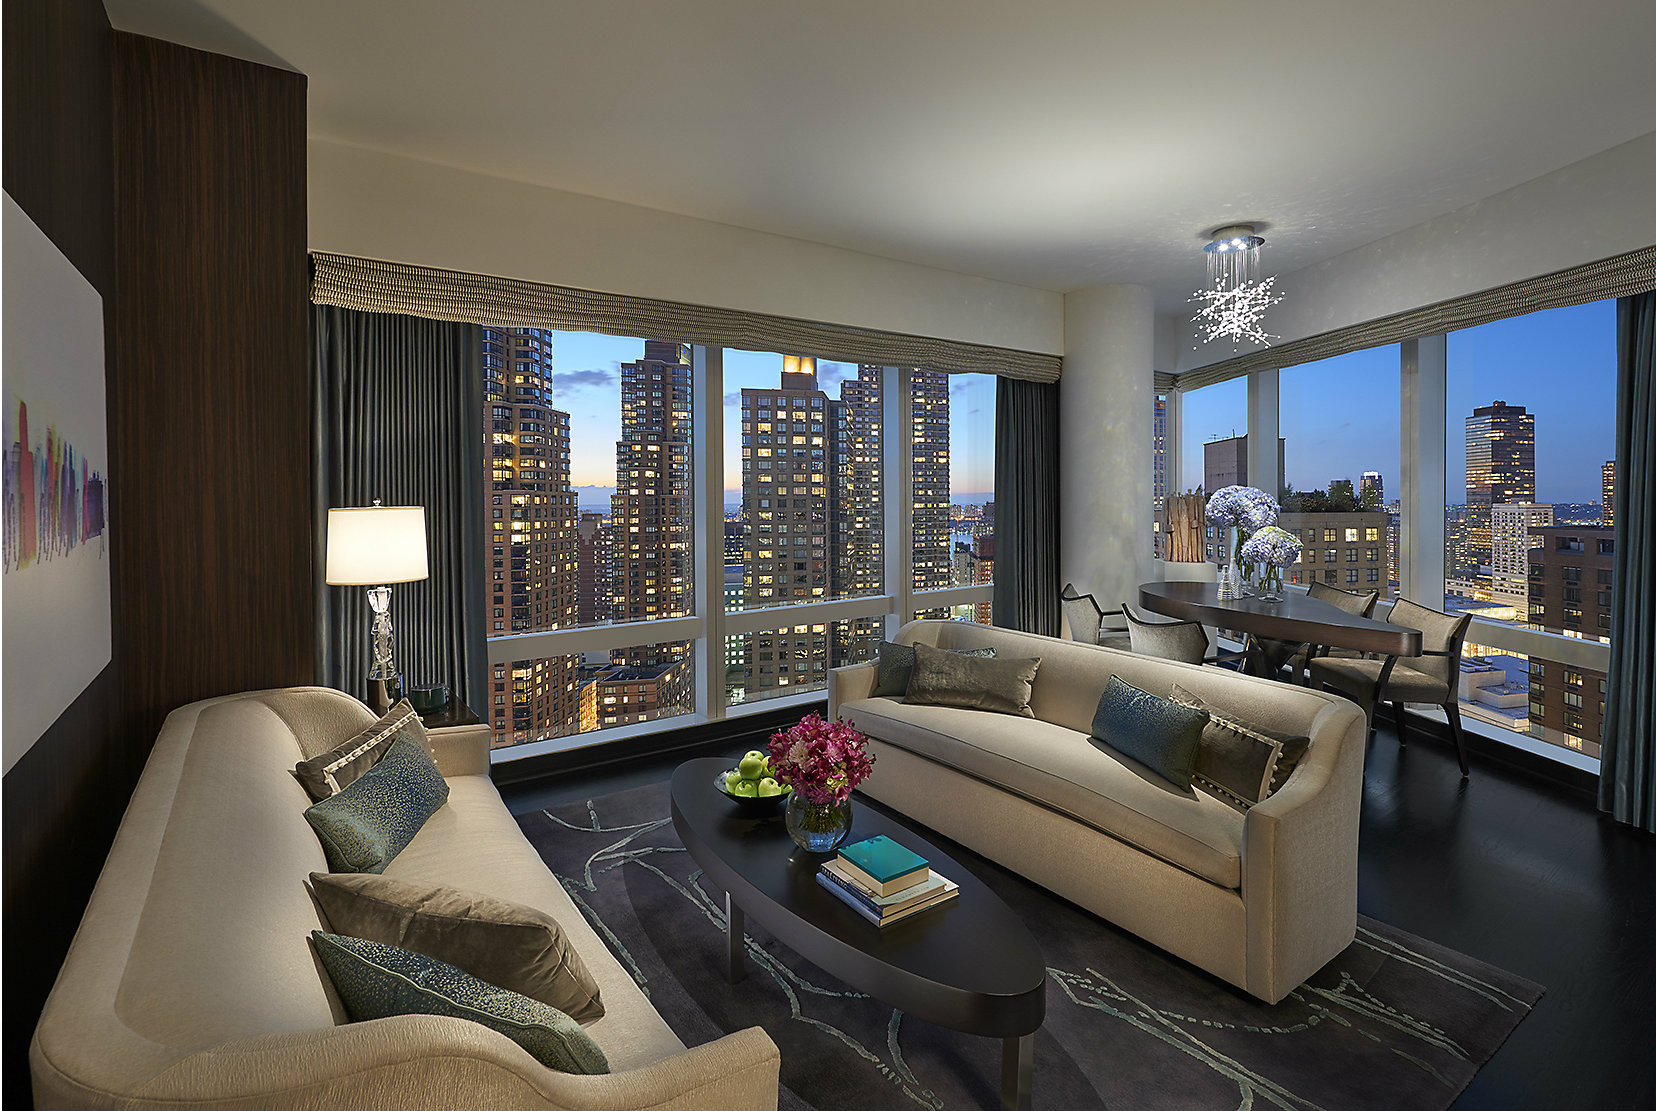 Renovated suite at the Mandarin Oriental